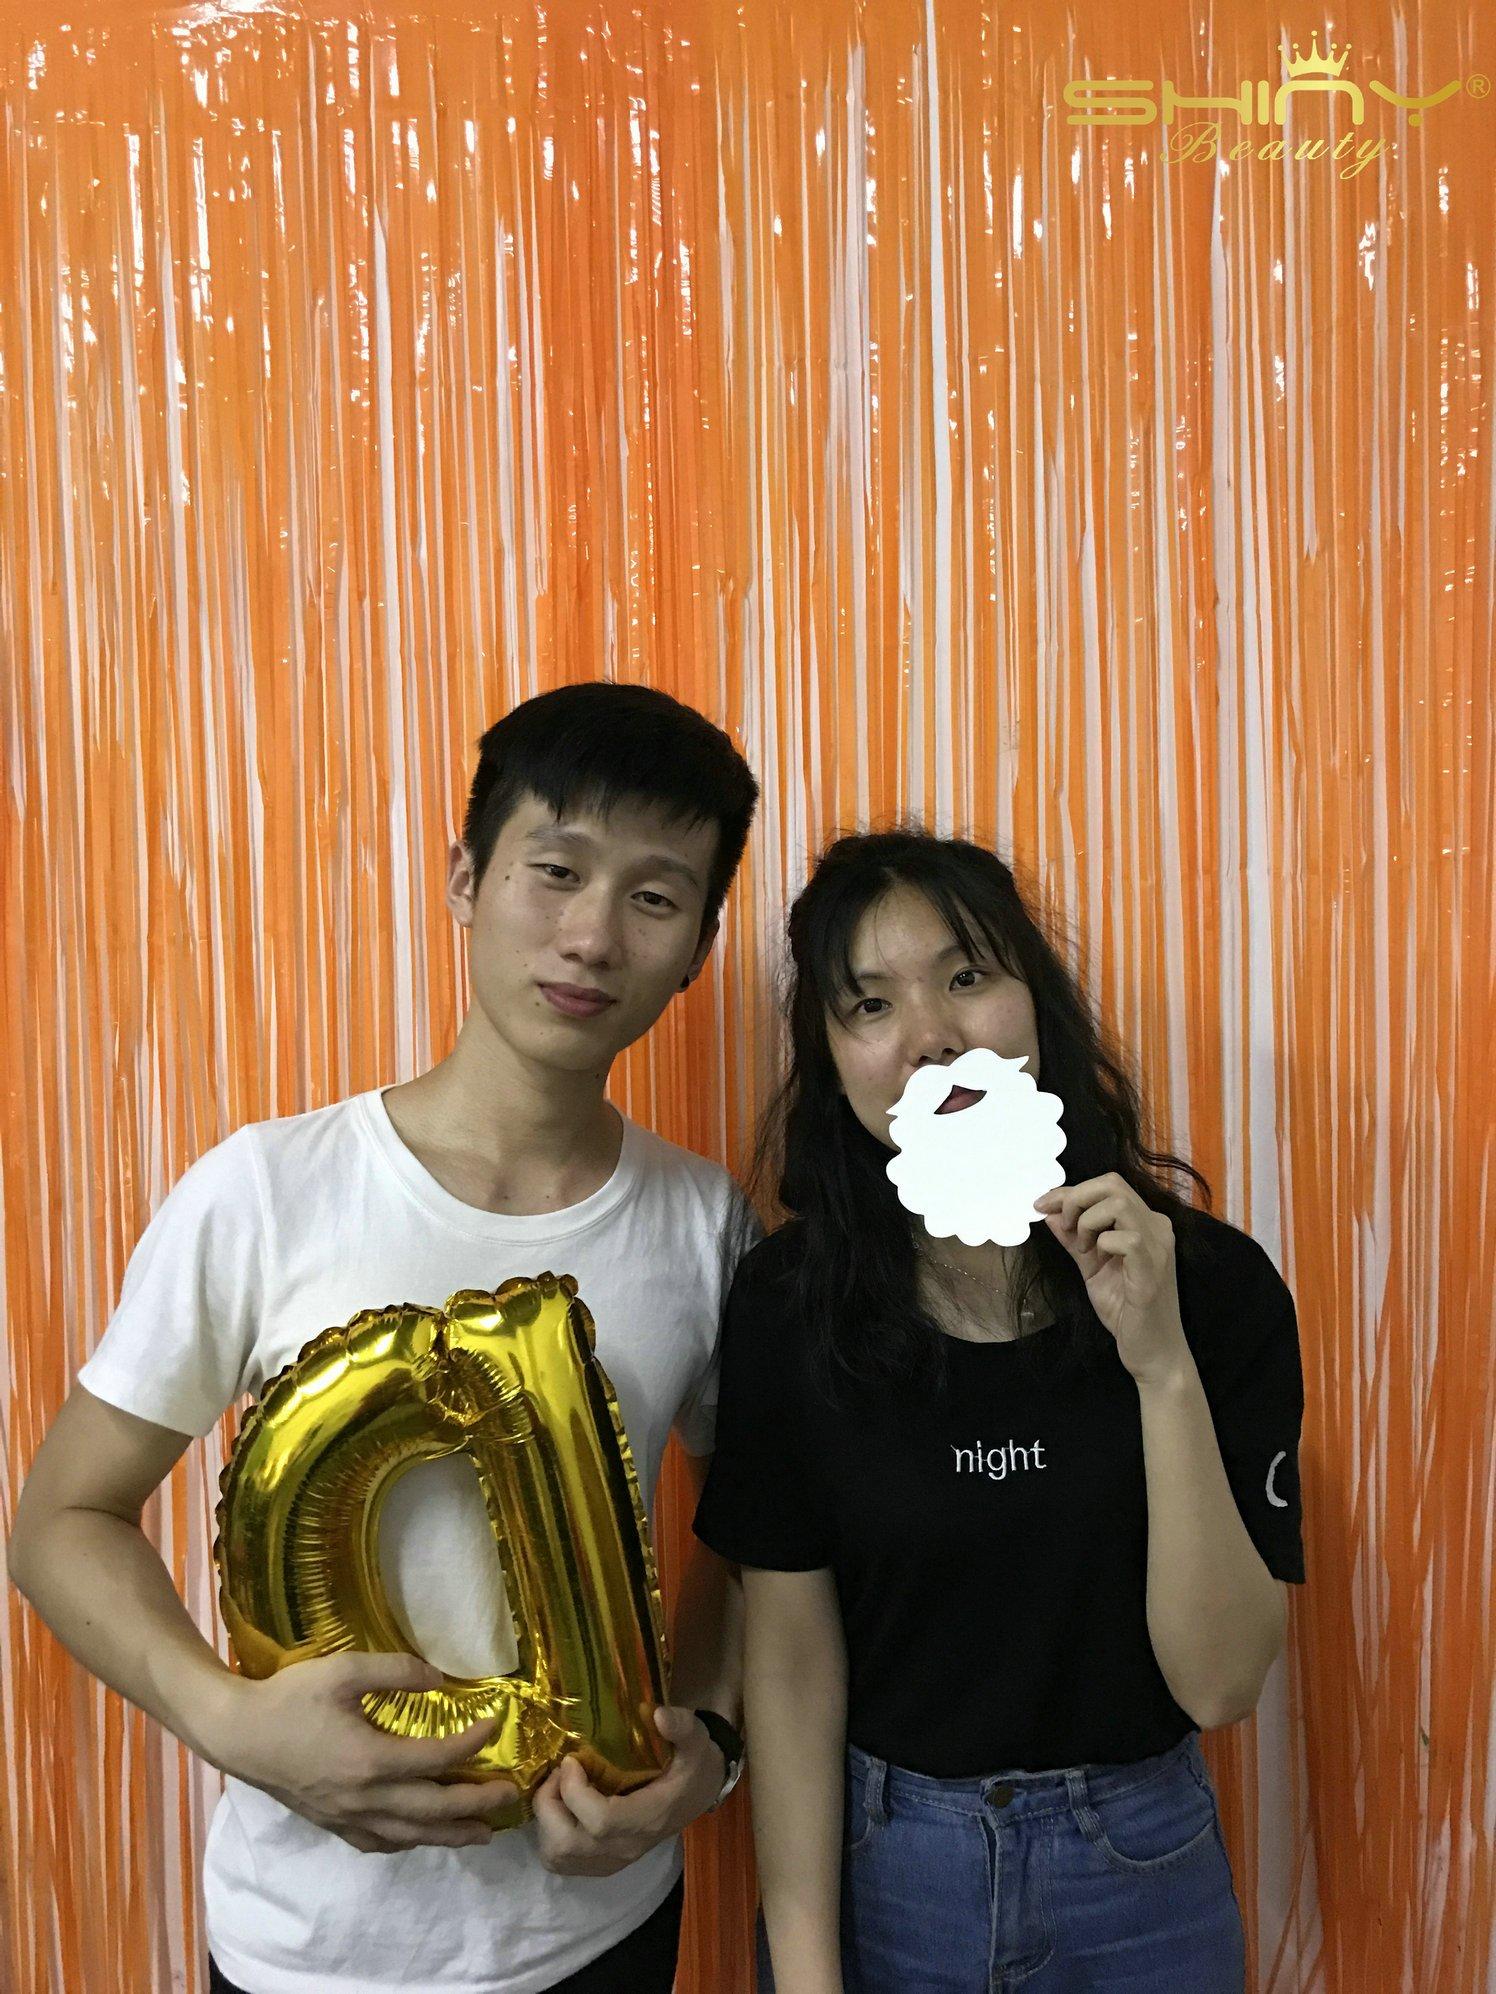 ShinyBeauty Foil Fringe-Backdrop-9FTx8FT-Orange Metallic Door Window Curtain Party/Birthday/Wedding Decoration (9FTx8FT, Orange)